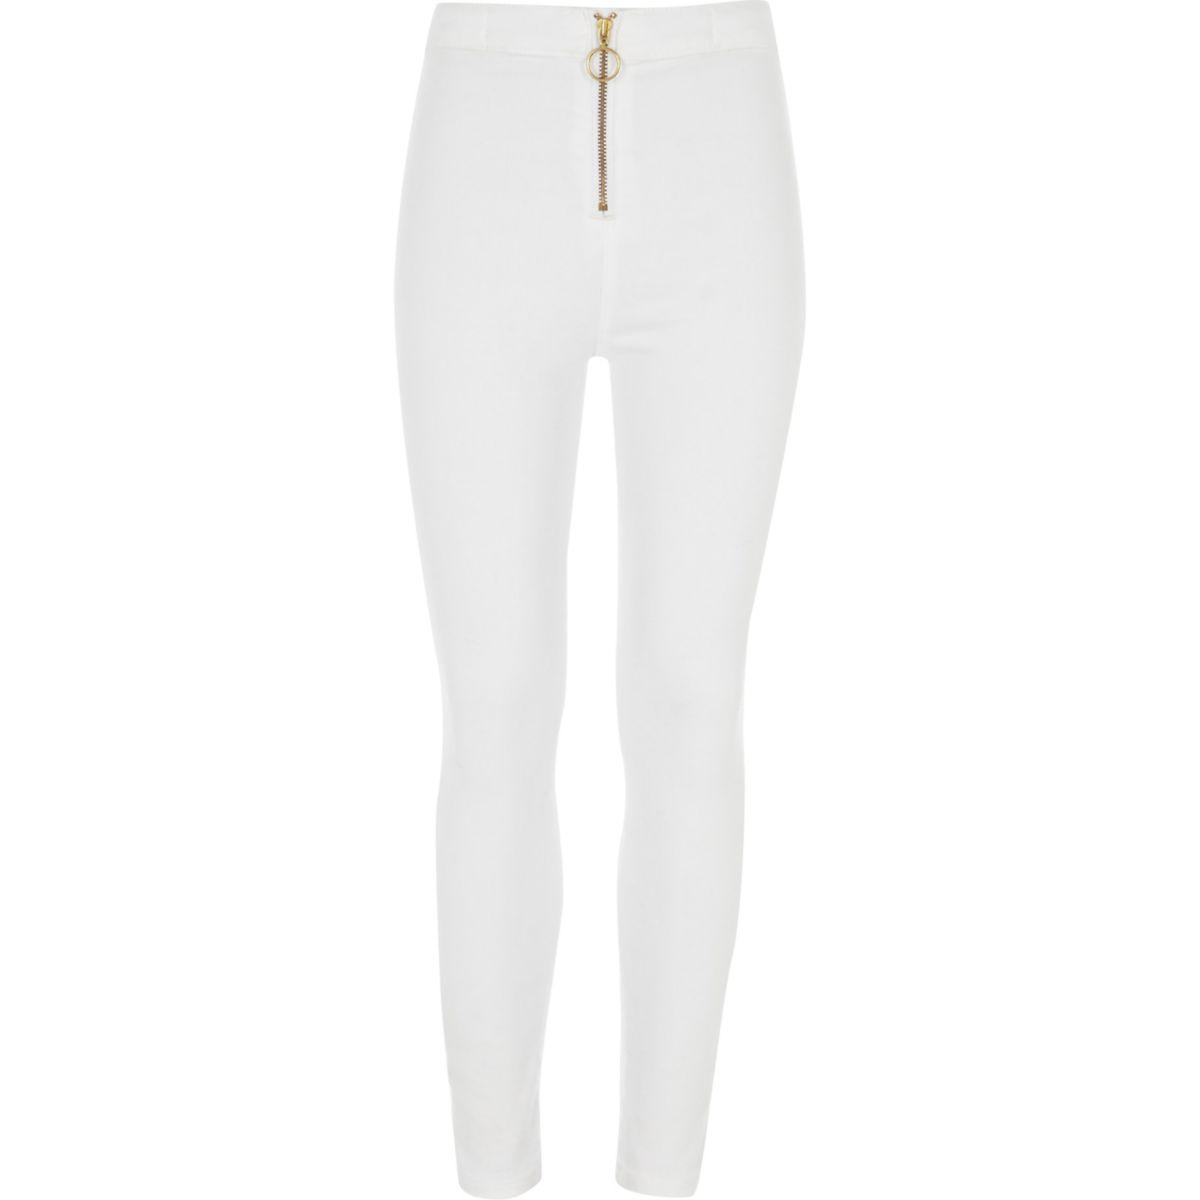 Molly – Jean super skinny blanc zippé pour fille